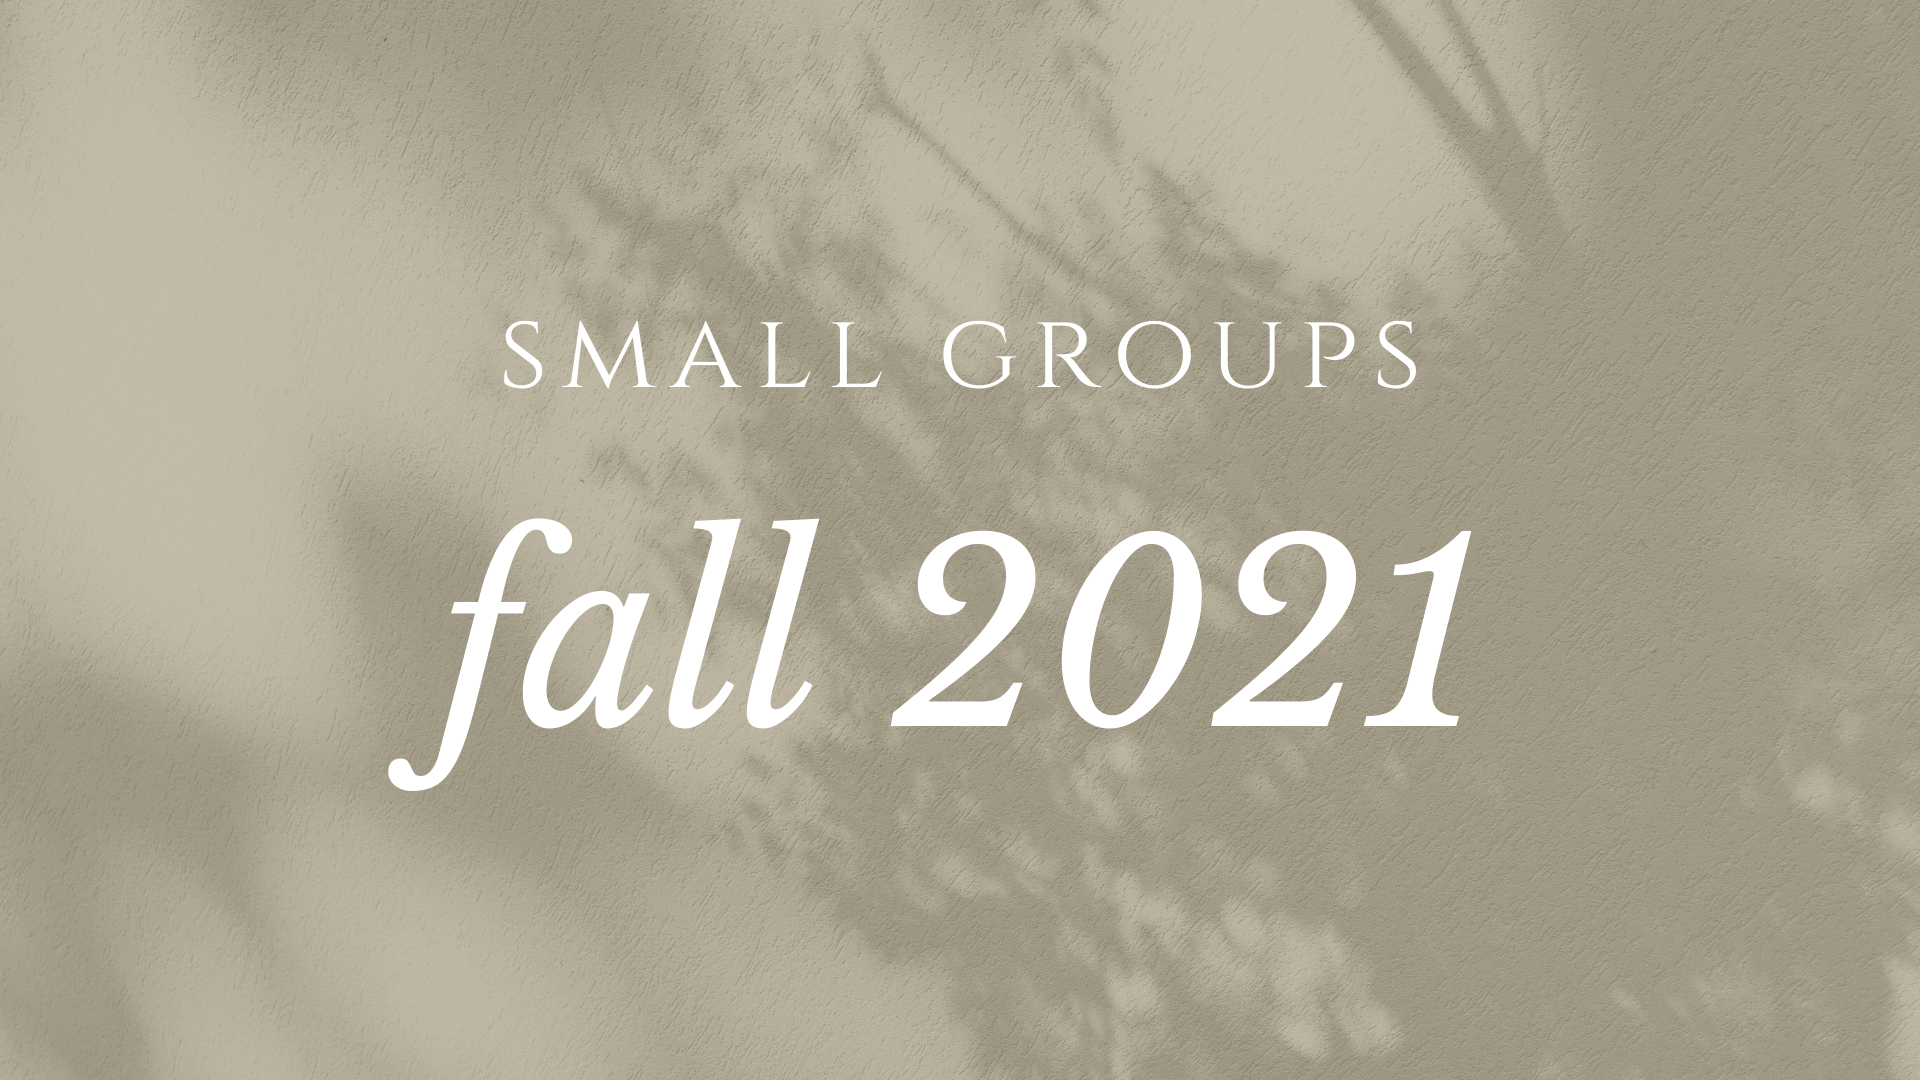 Sermon Study: Session 2 (Fall 2021)